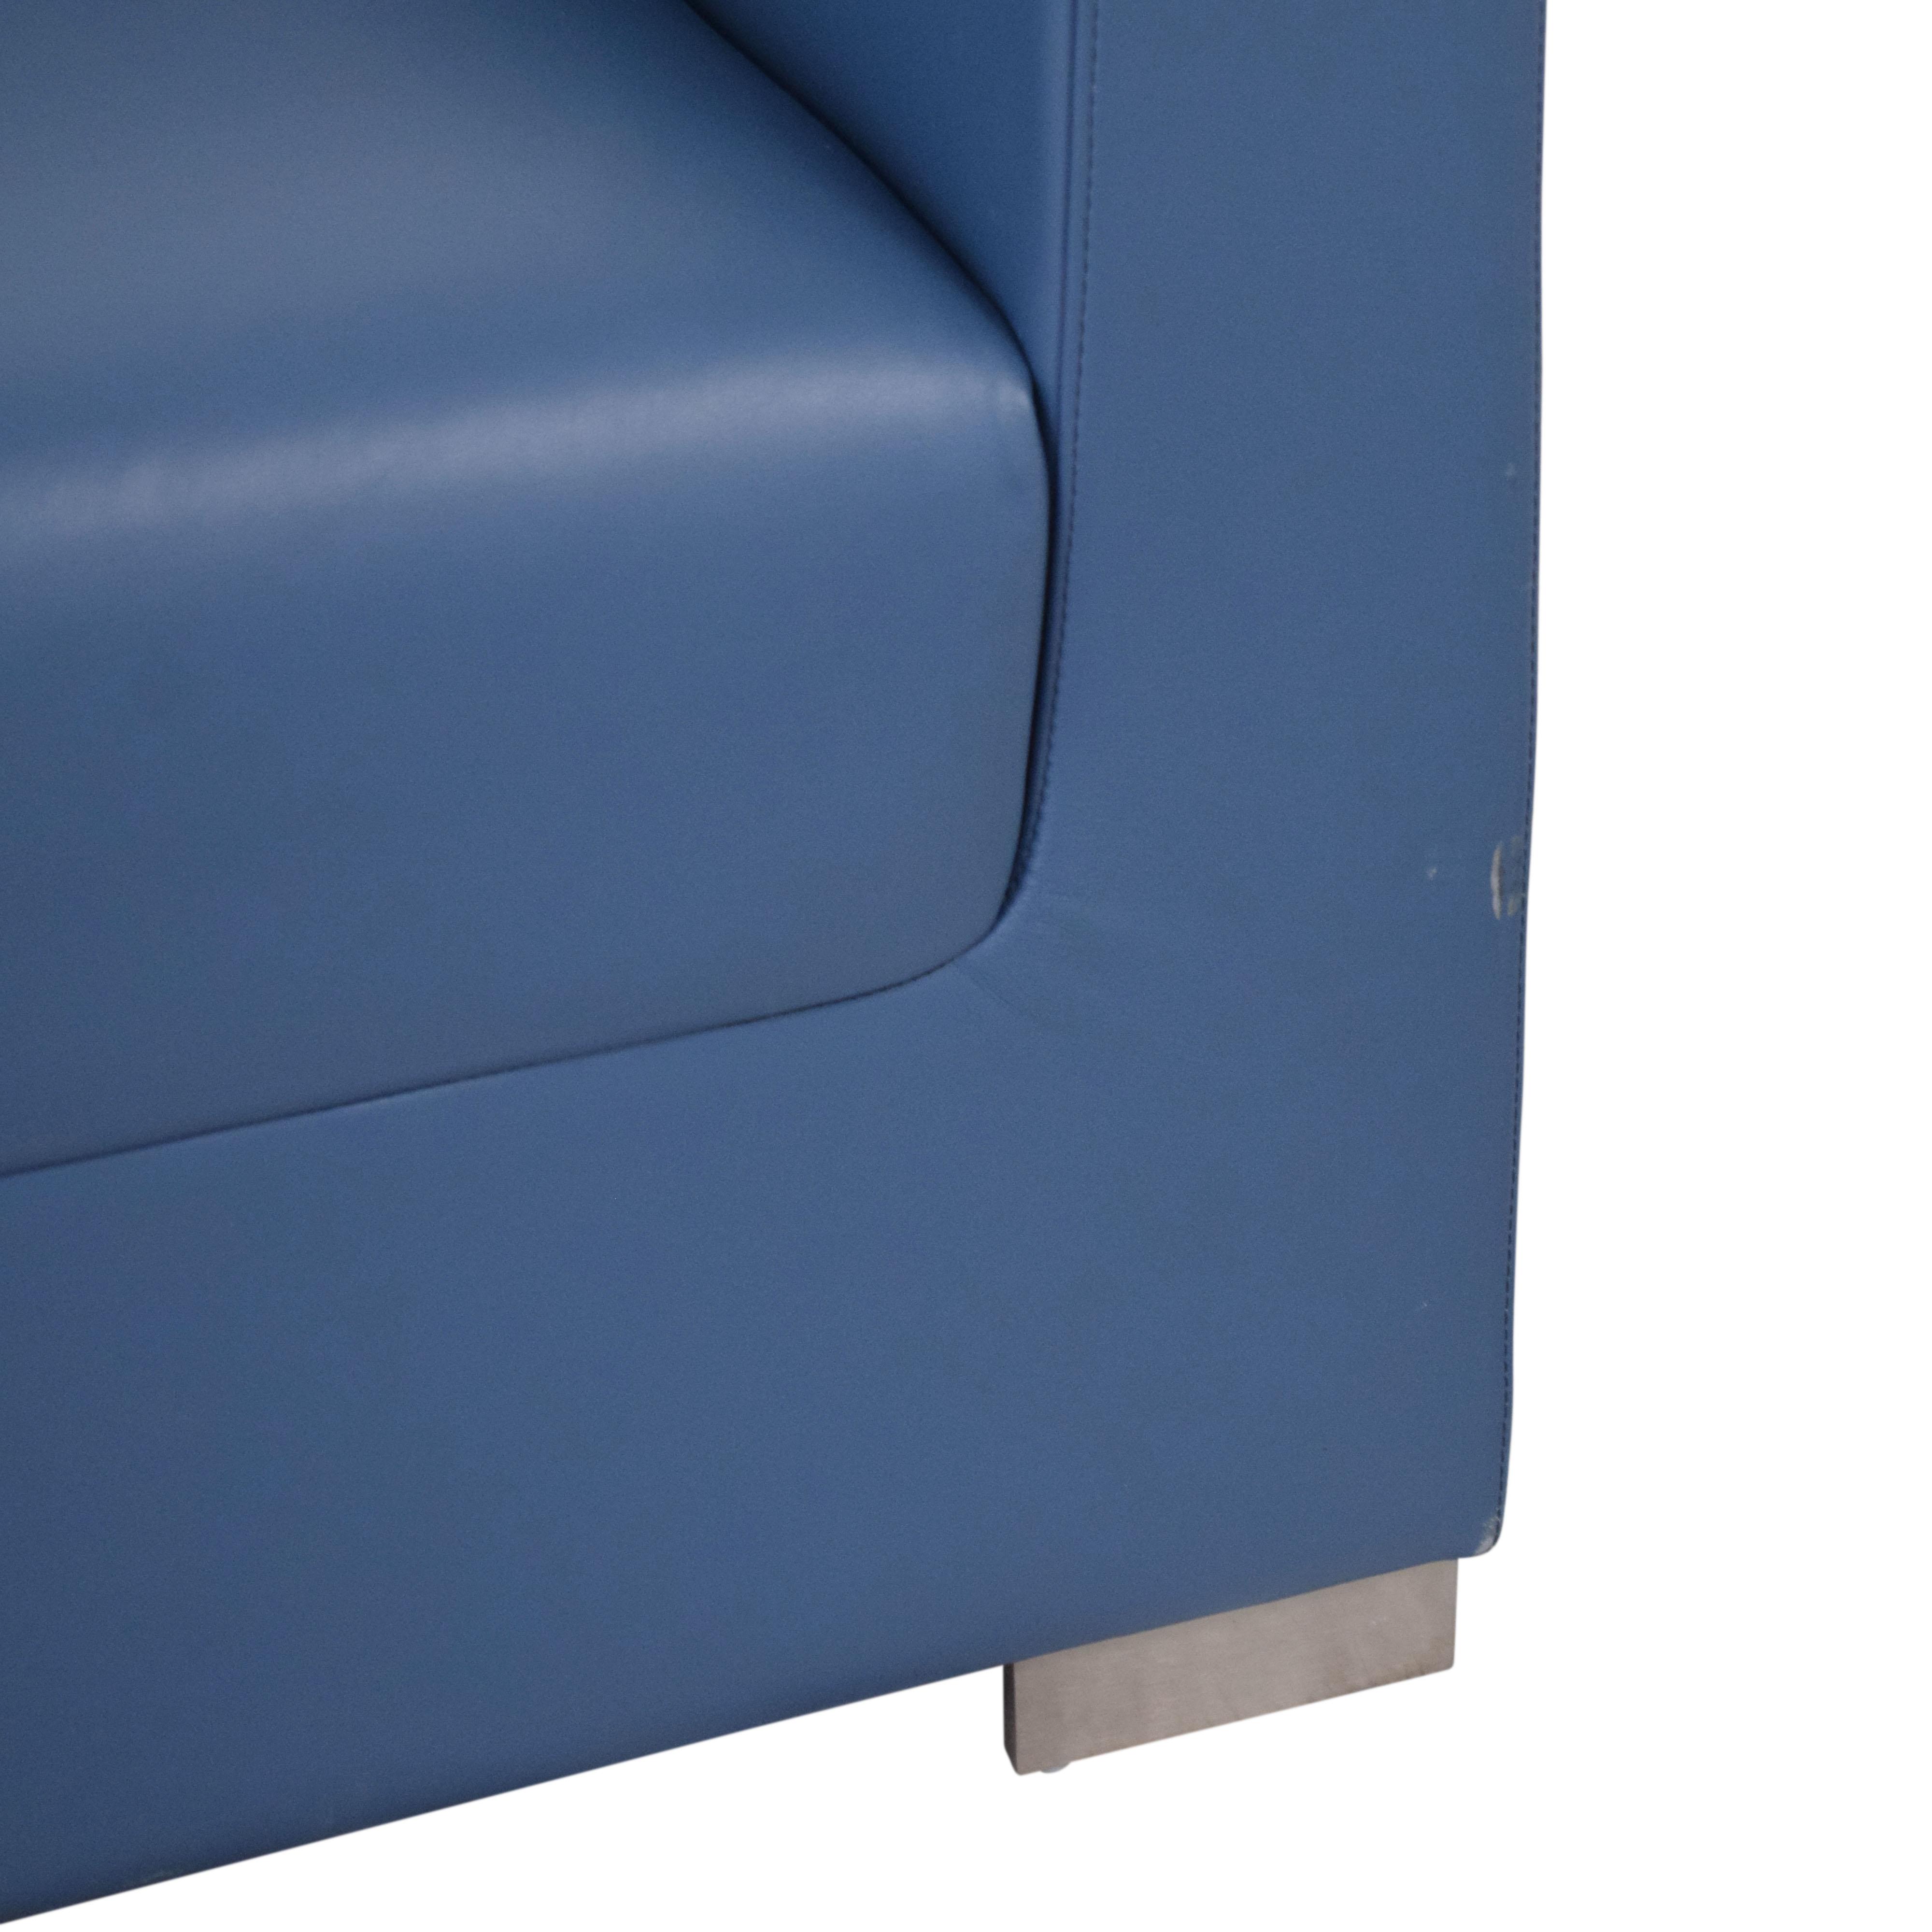 Bernhardt Bernhardt Design Blue Leather Arm Chair dimensions